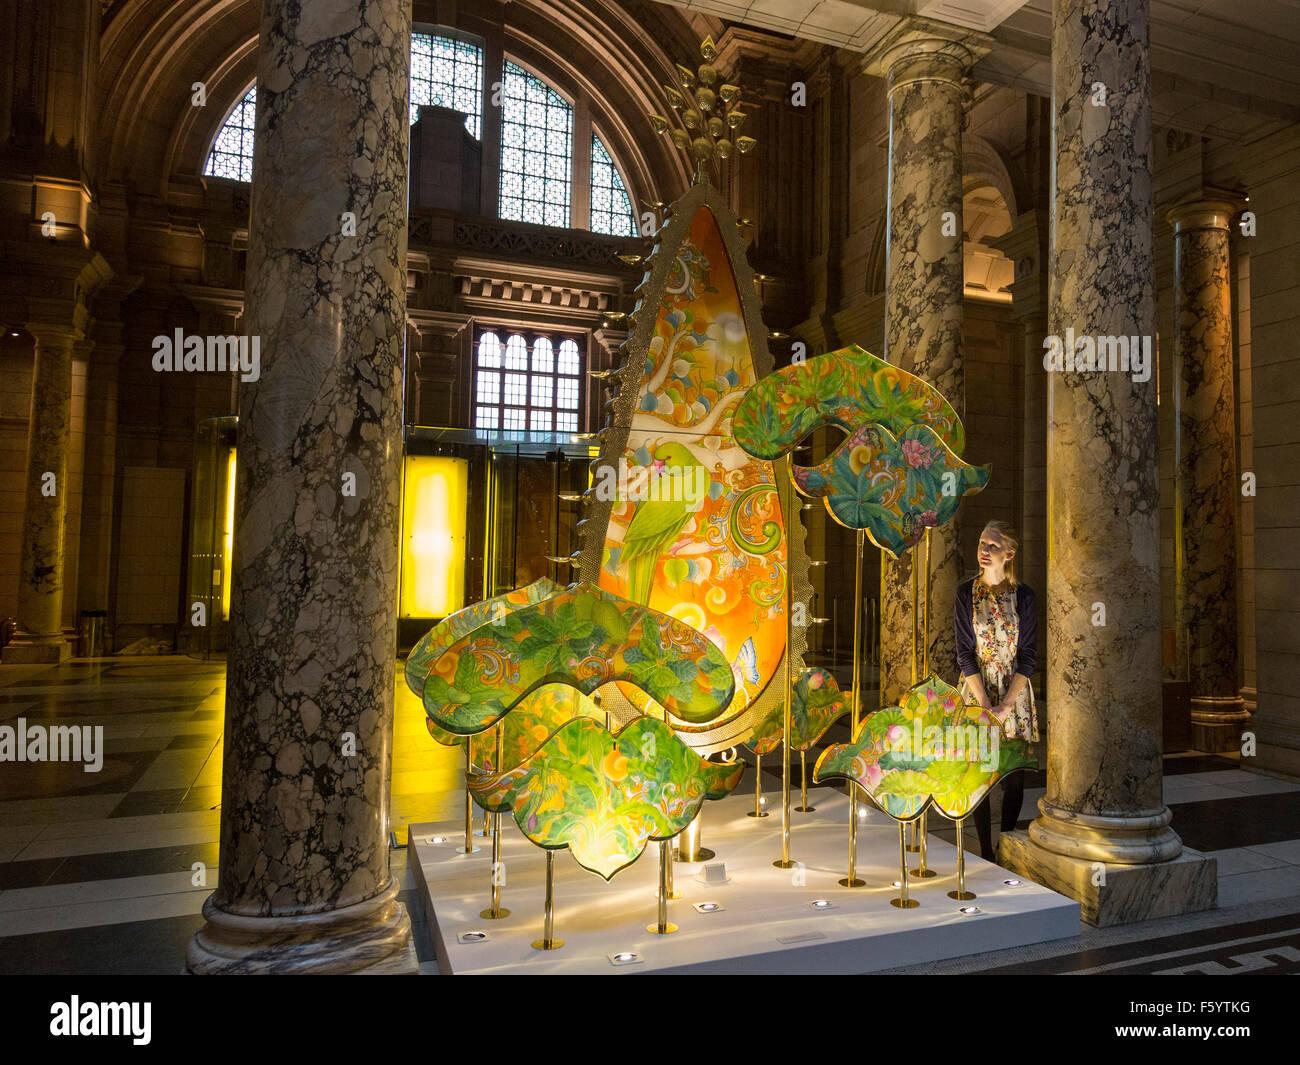 London, UK. 10th November, 2015. New Delhi-based design duo Sarthak and Sahil reveal their new festive light installation, Stock Photo